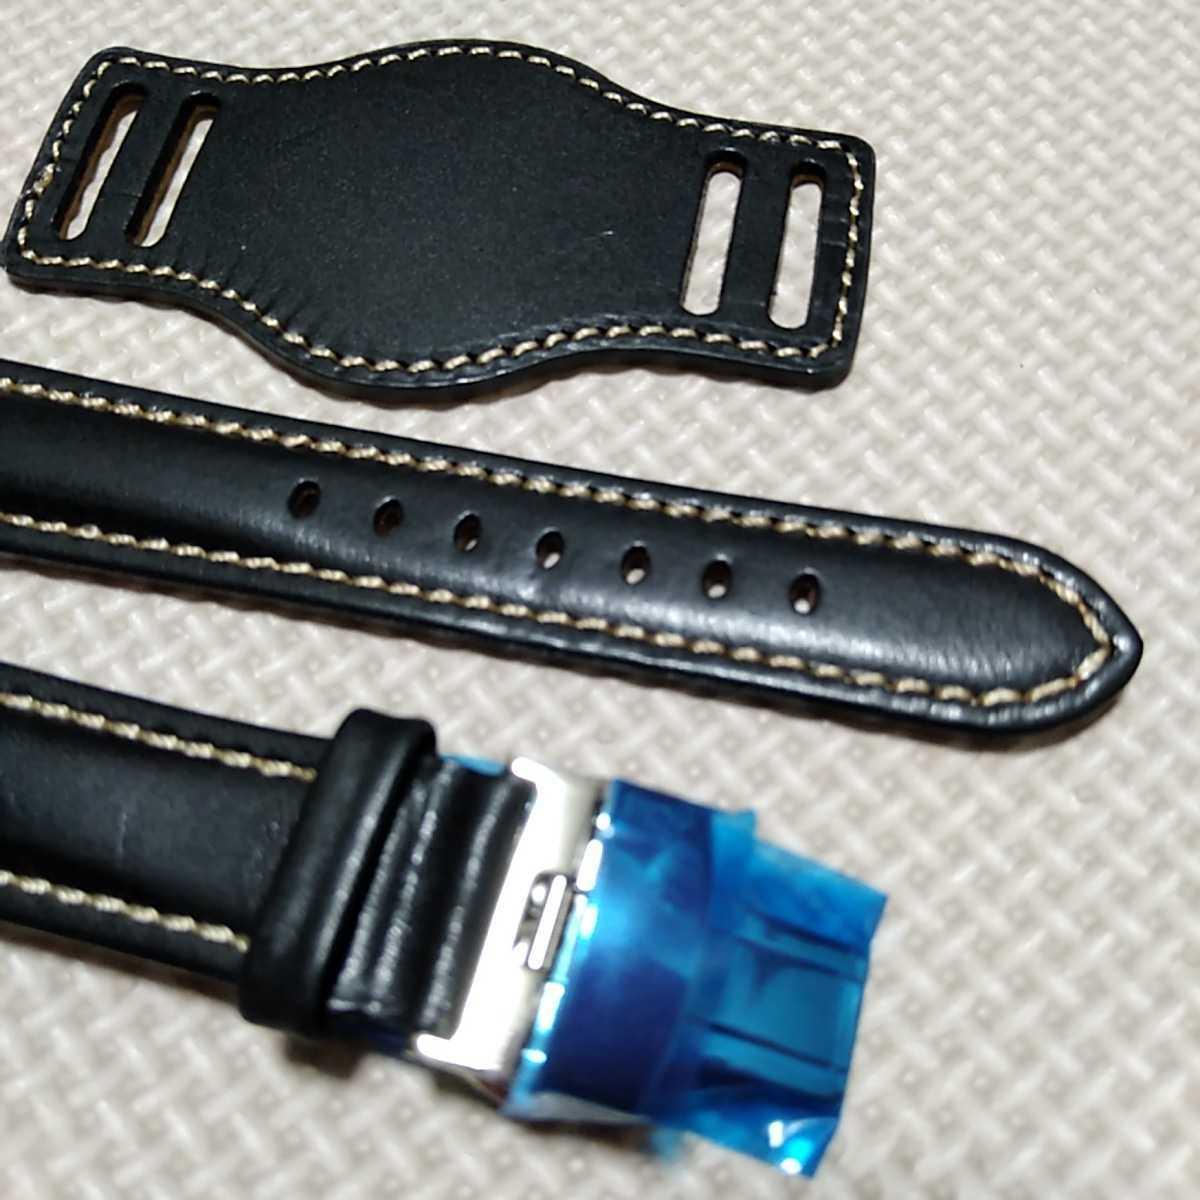 No75 ブンド BUND 本革レザーベルト 腕時計ベルト 交換用ストラップ ブラック 20mm 未使用 Dバックル 高品質 ドイツパイロット 空軍_画像3